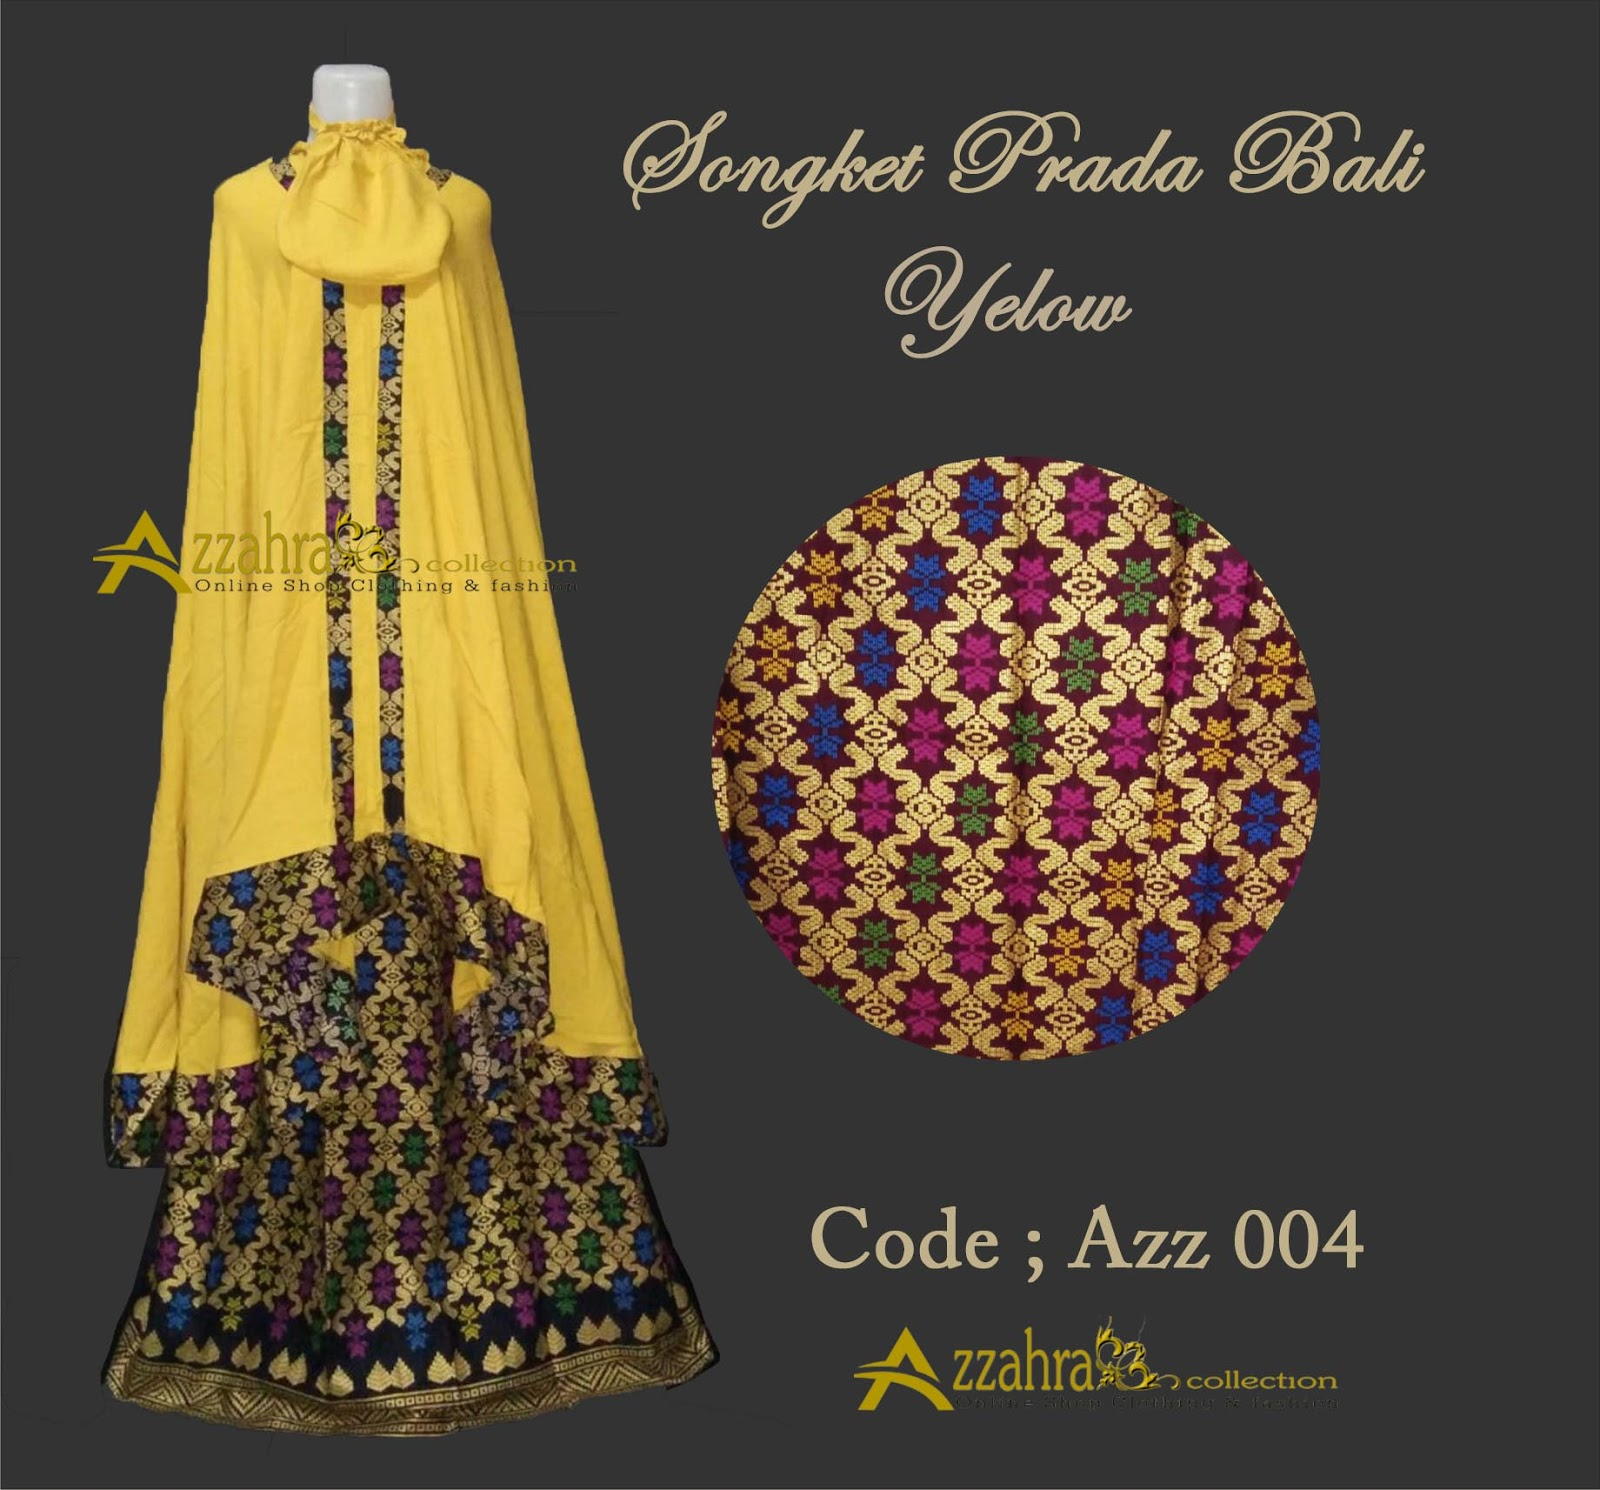 Gambar Mukena Prada Bali Yelow Kuning Gold